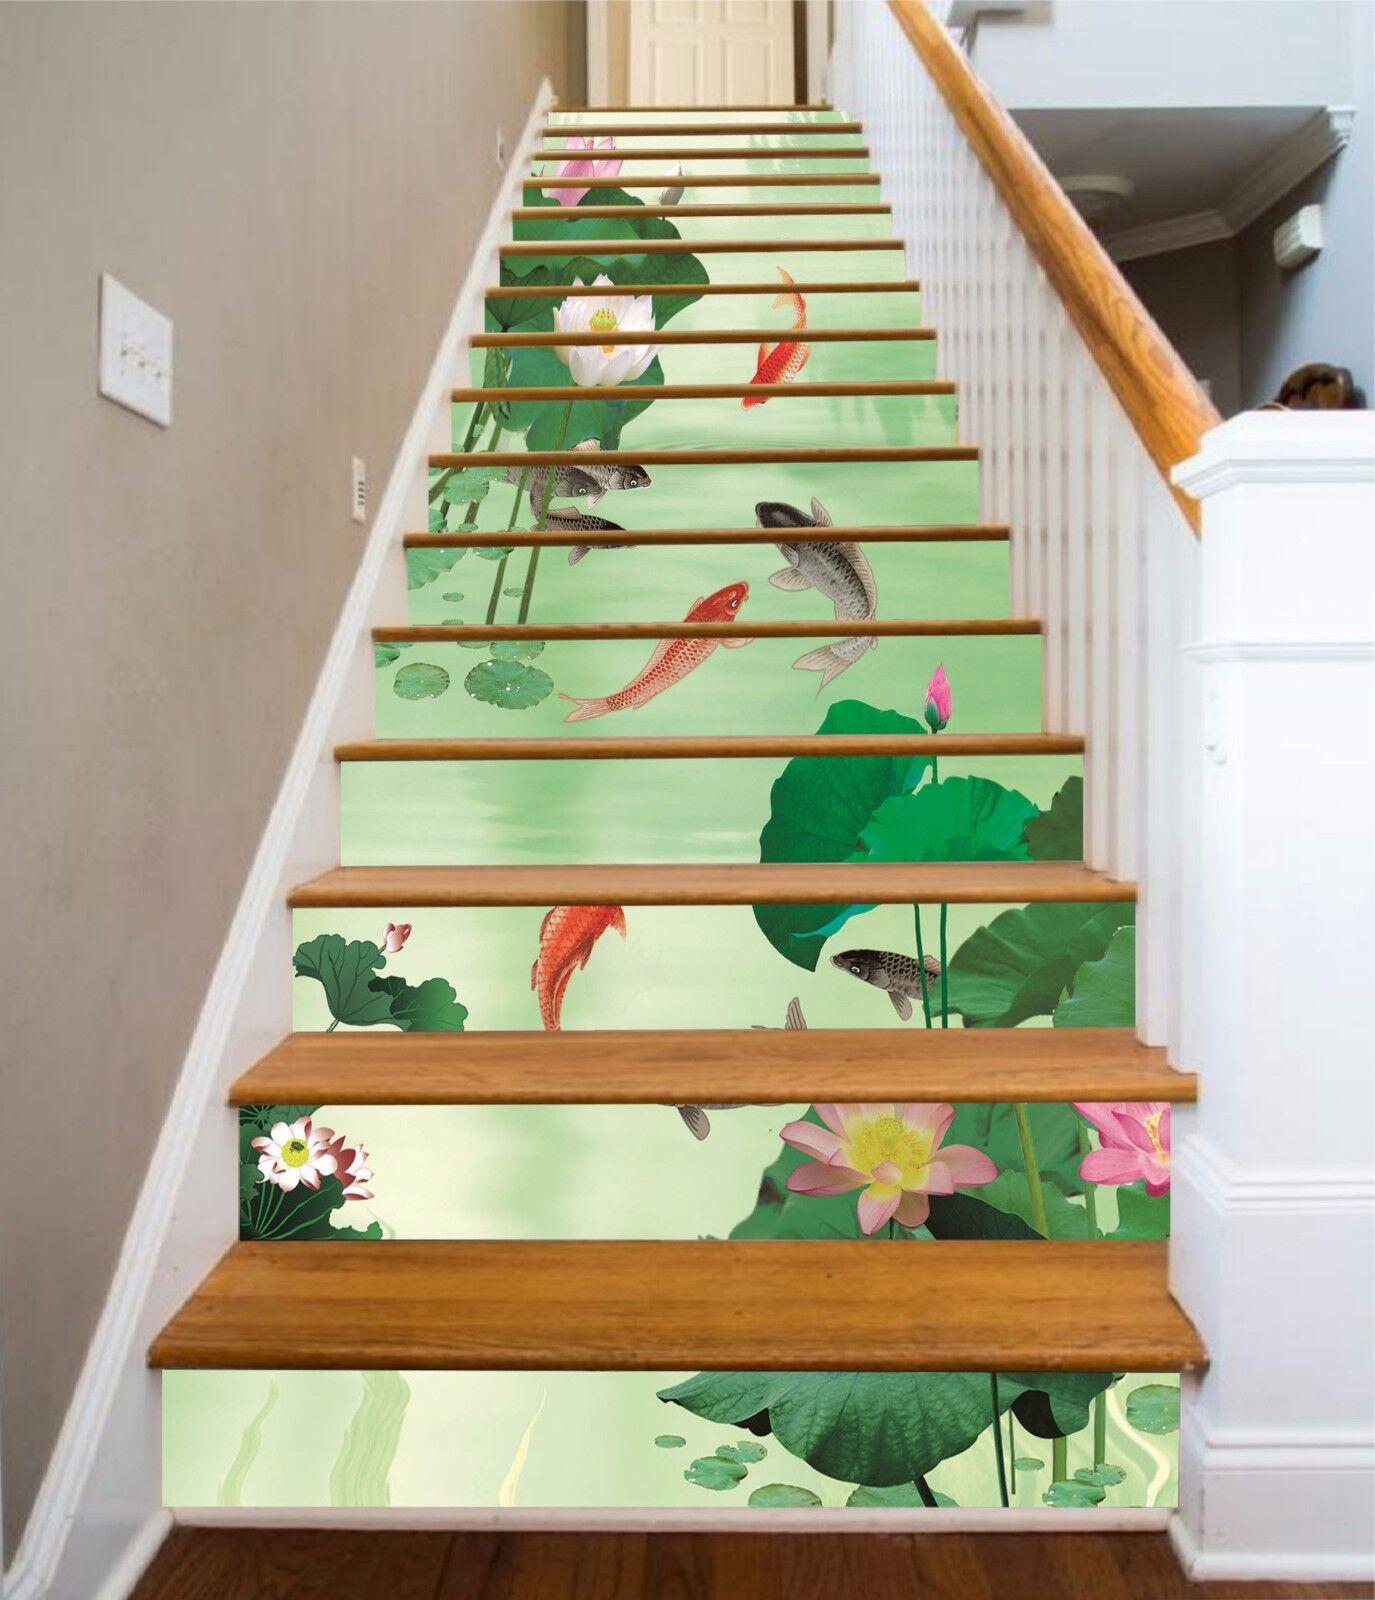 3D Pond fish 887 Stair Risers Decoration Photo Mural Vinyl Decal Wallpaper UK